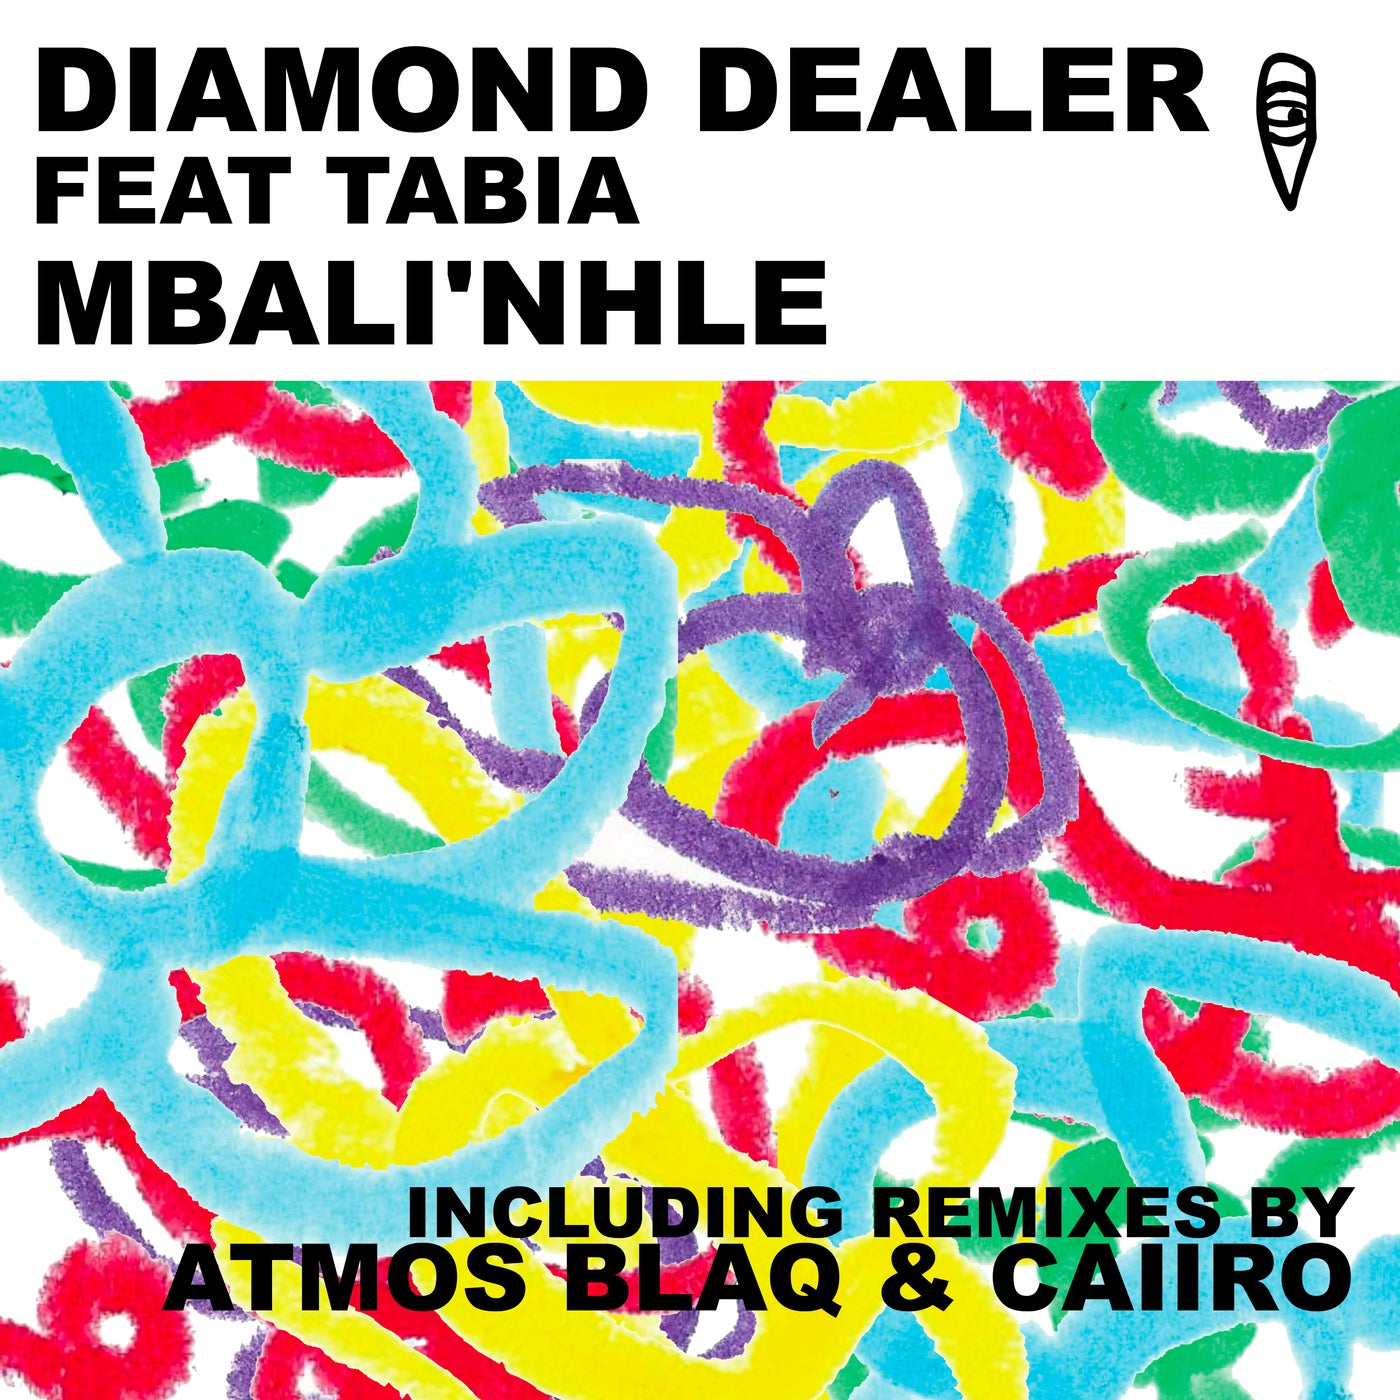 Mbali'nhle feat. Tabia (Caiiro Remix)